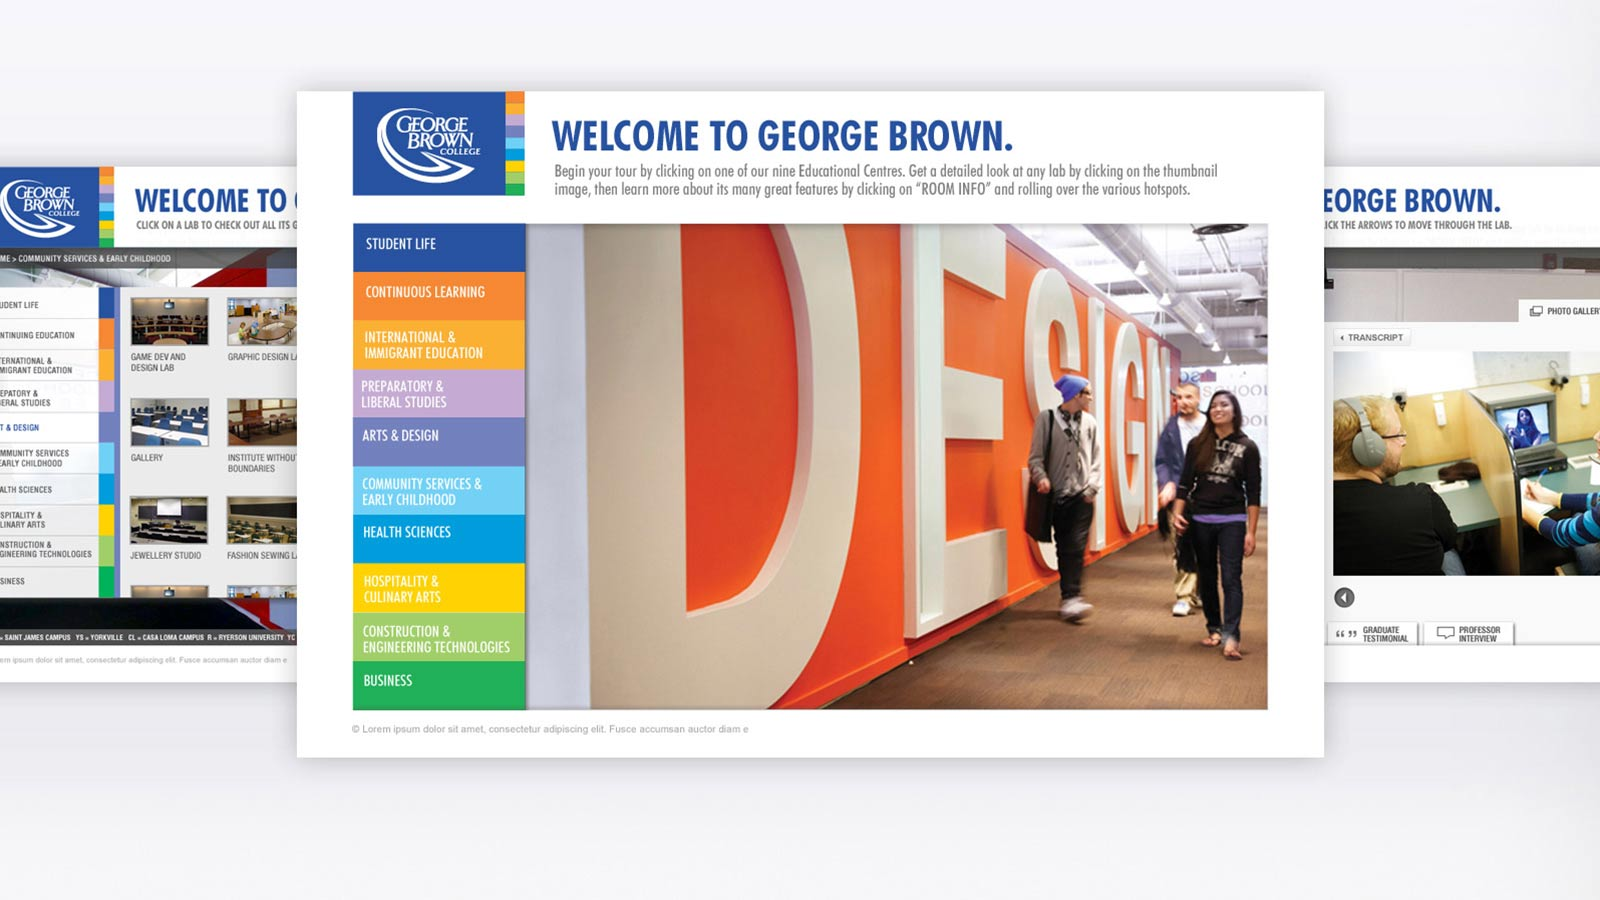 George Brown College | Website Development and Redesign | App Development, Broadcast Production, Digital Innovation, Digital Marketing, Mobile, Responsive Design, Strategy